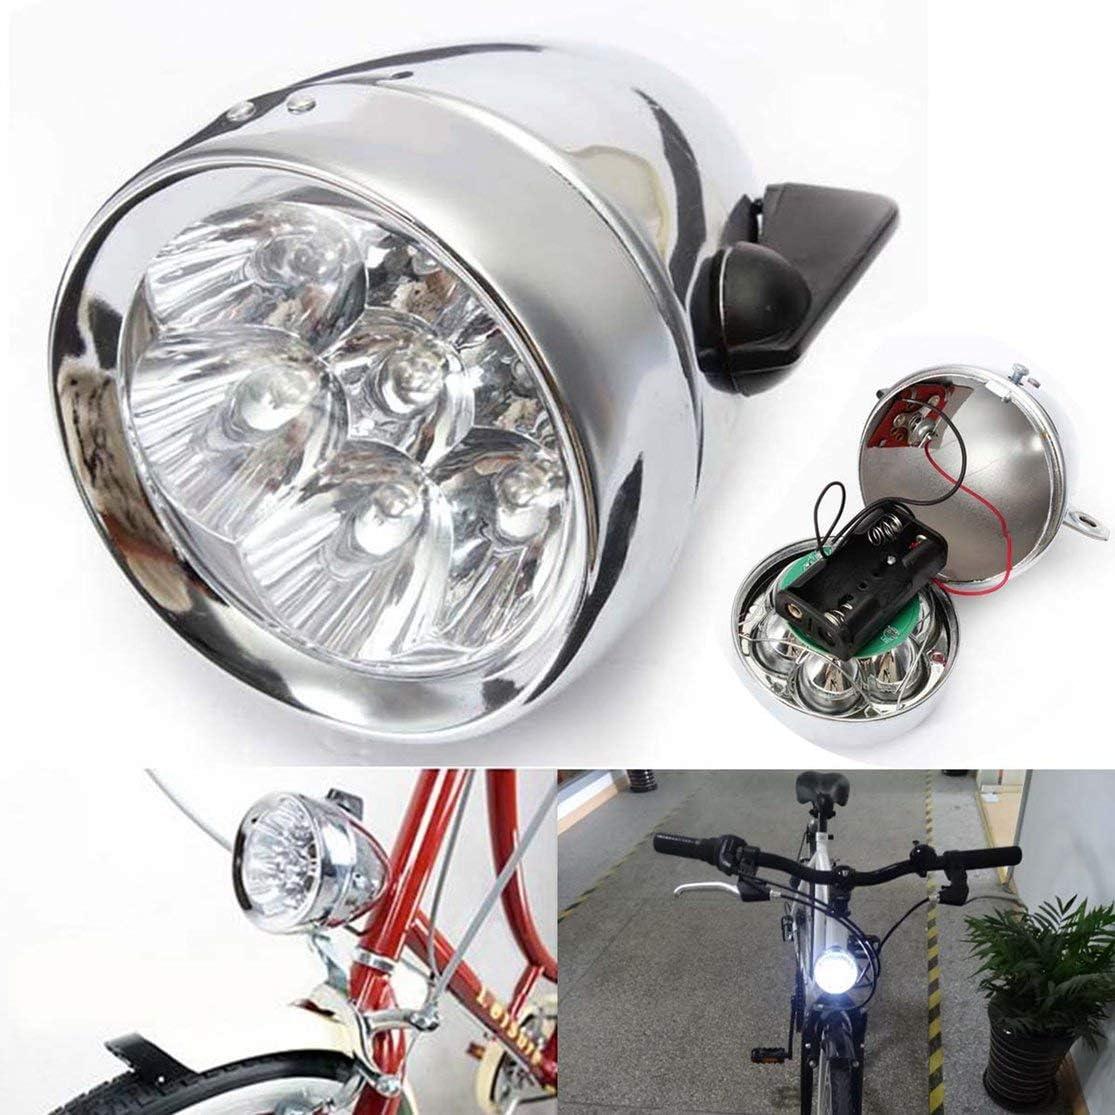 Kaemma Lámpara de luz Delantera de Bicicleta de Bicicleta Vintage ...